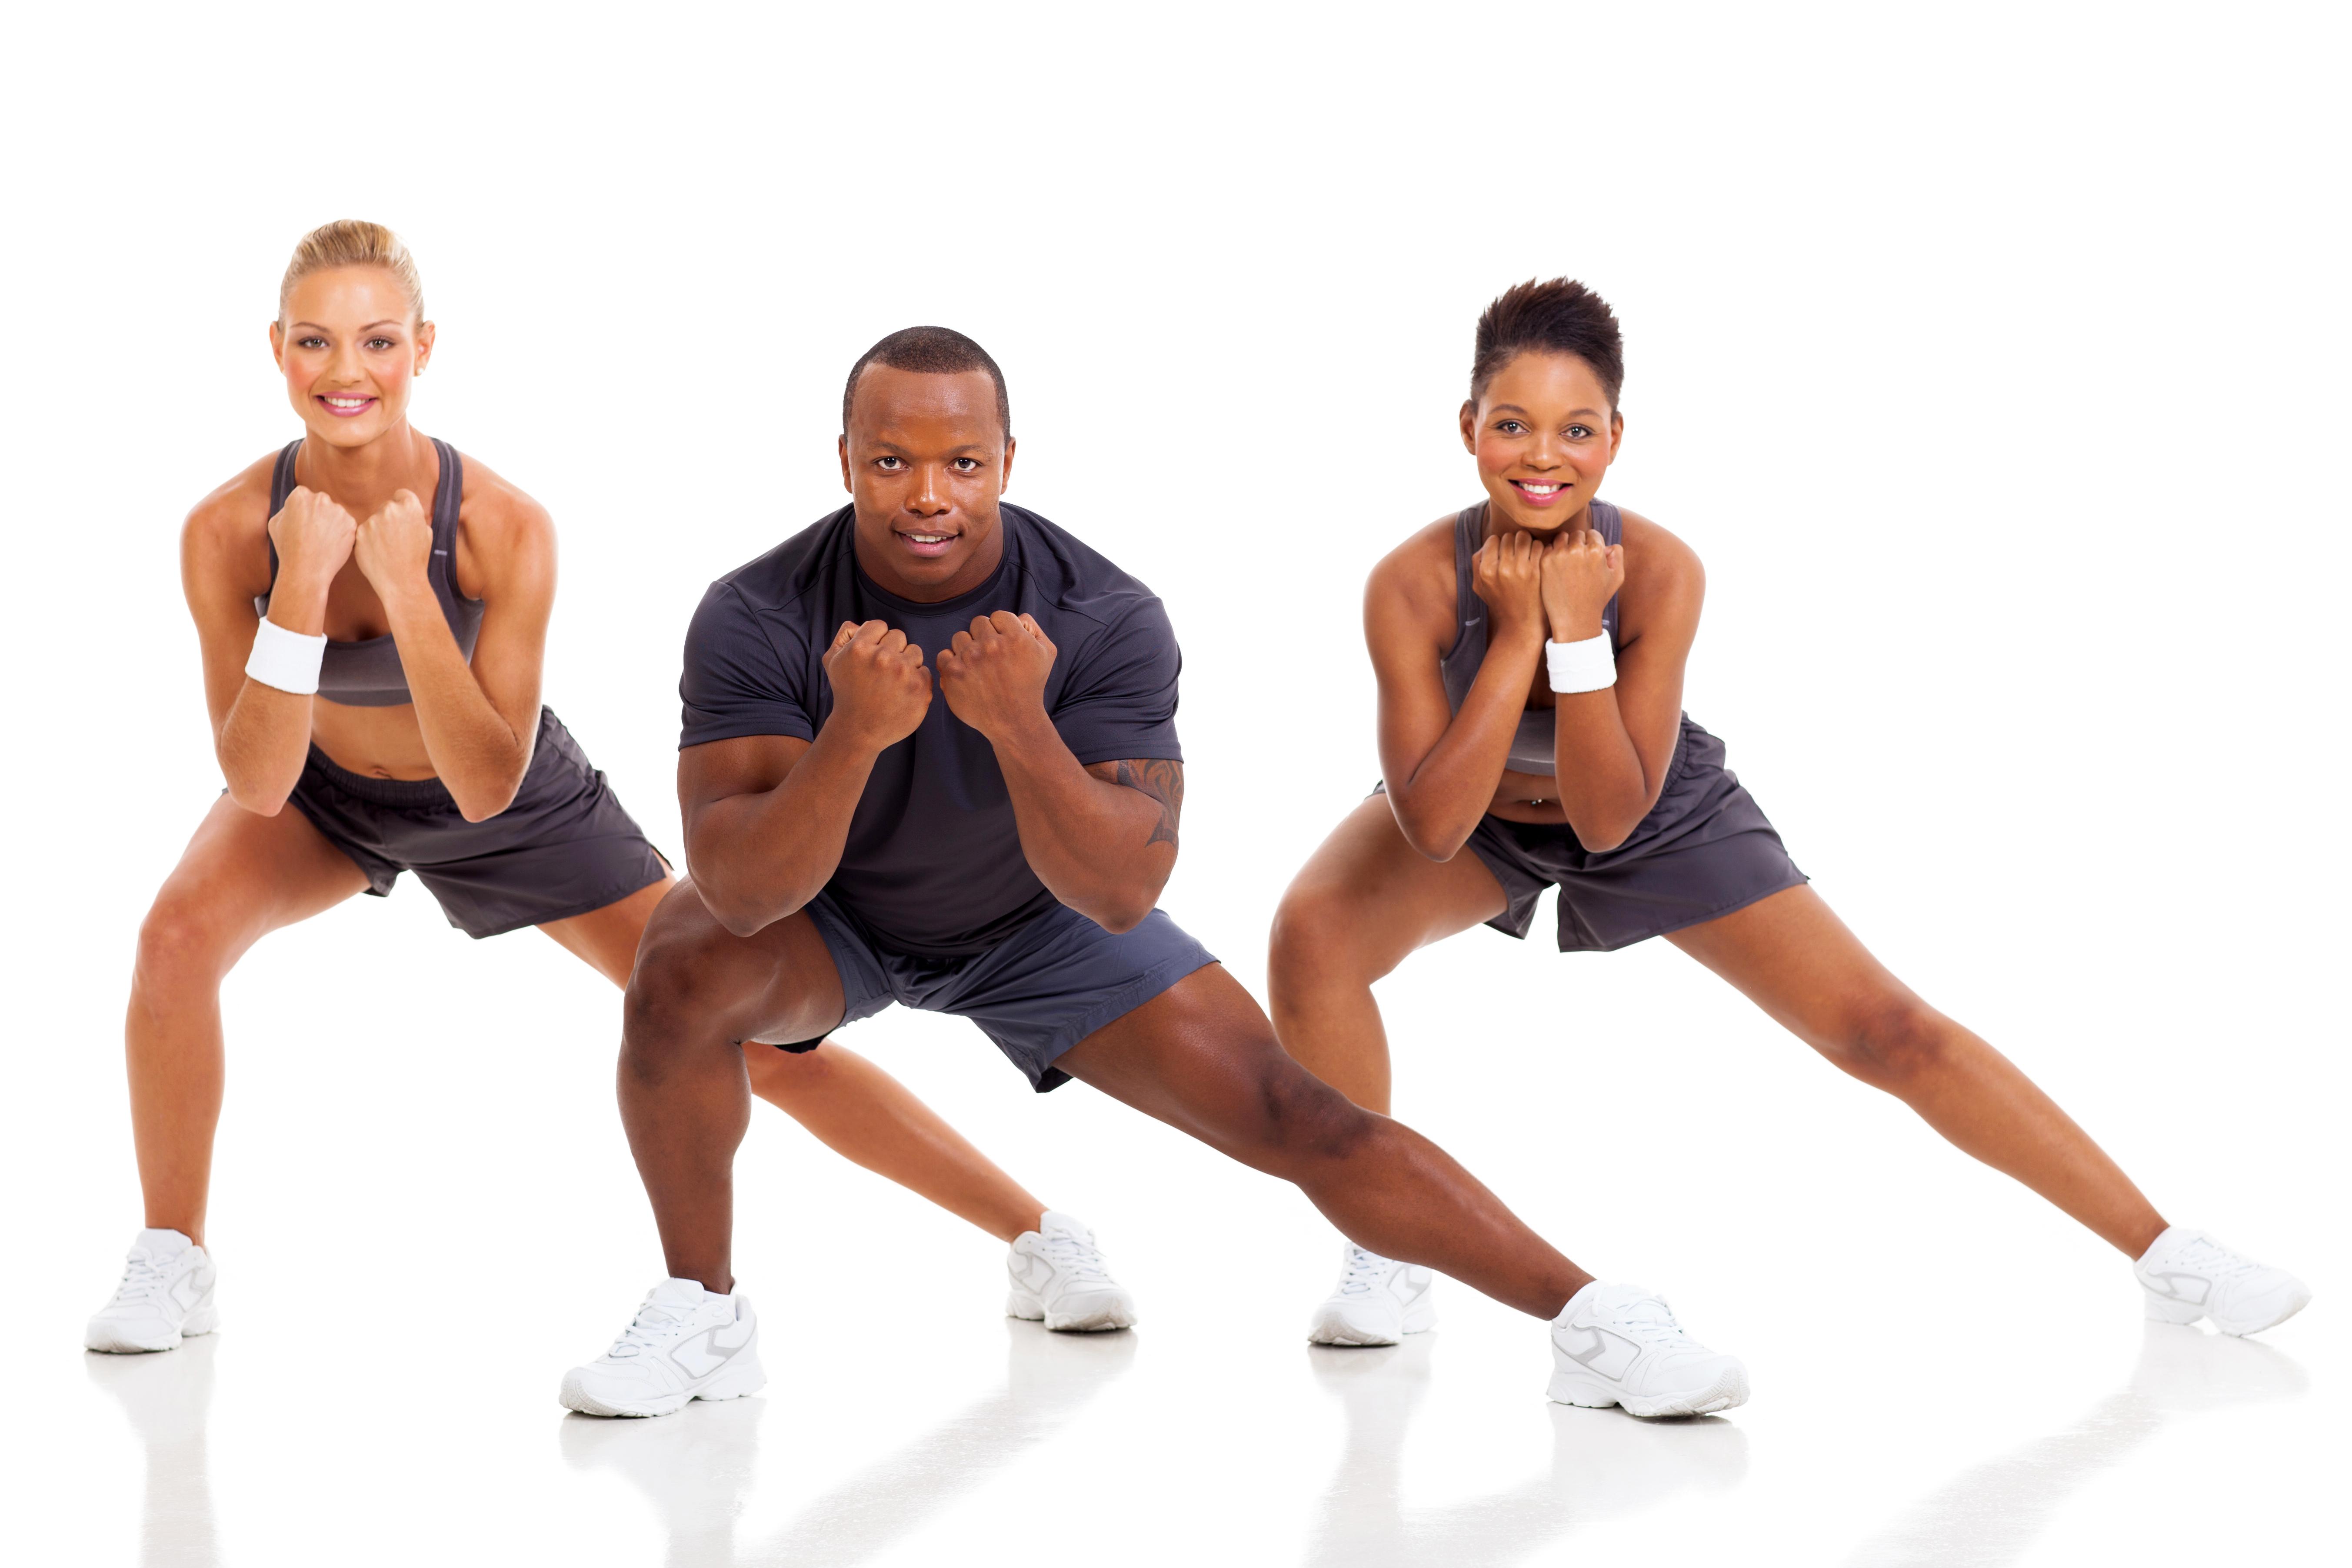 Basic Marketing Tools (health & Fitness)